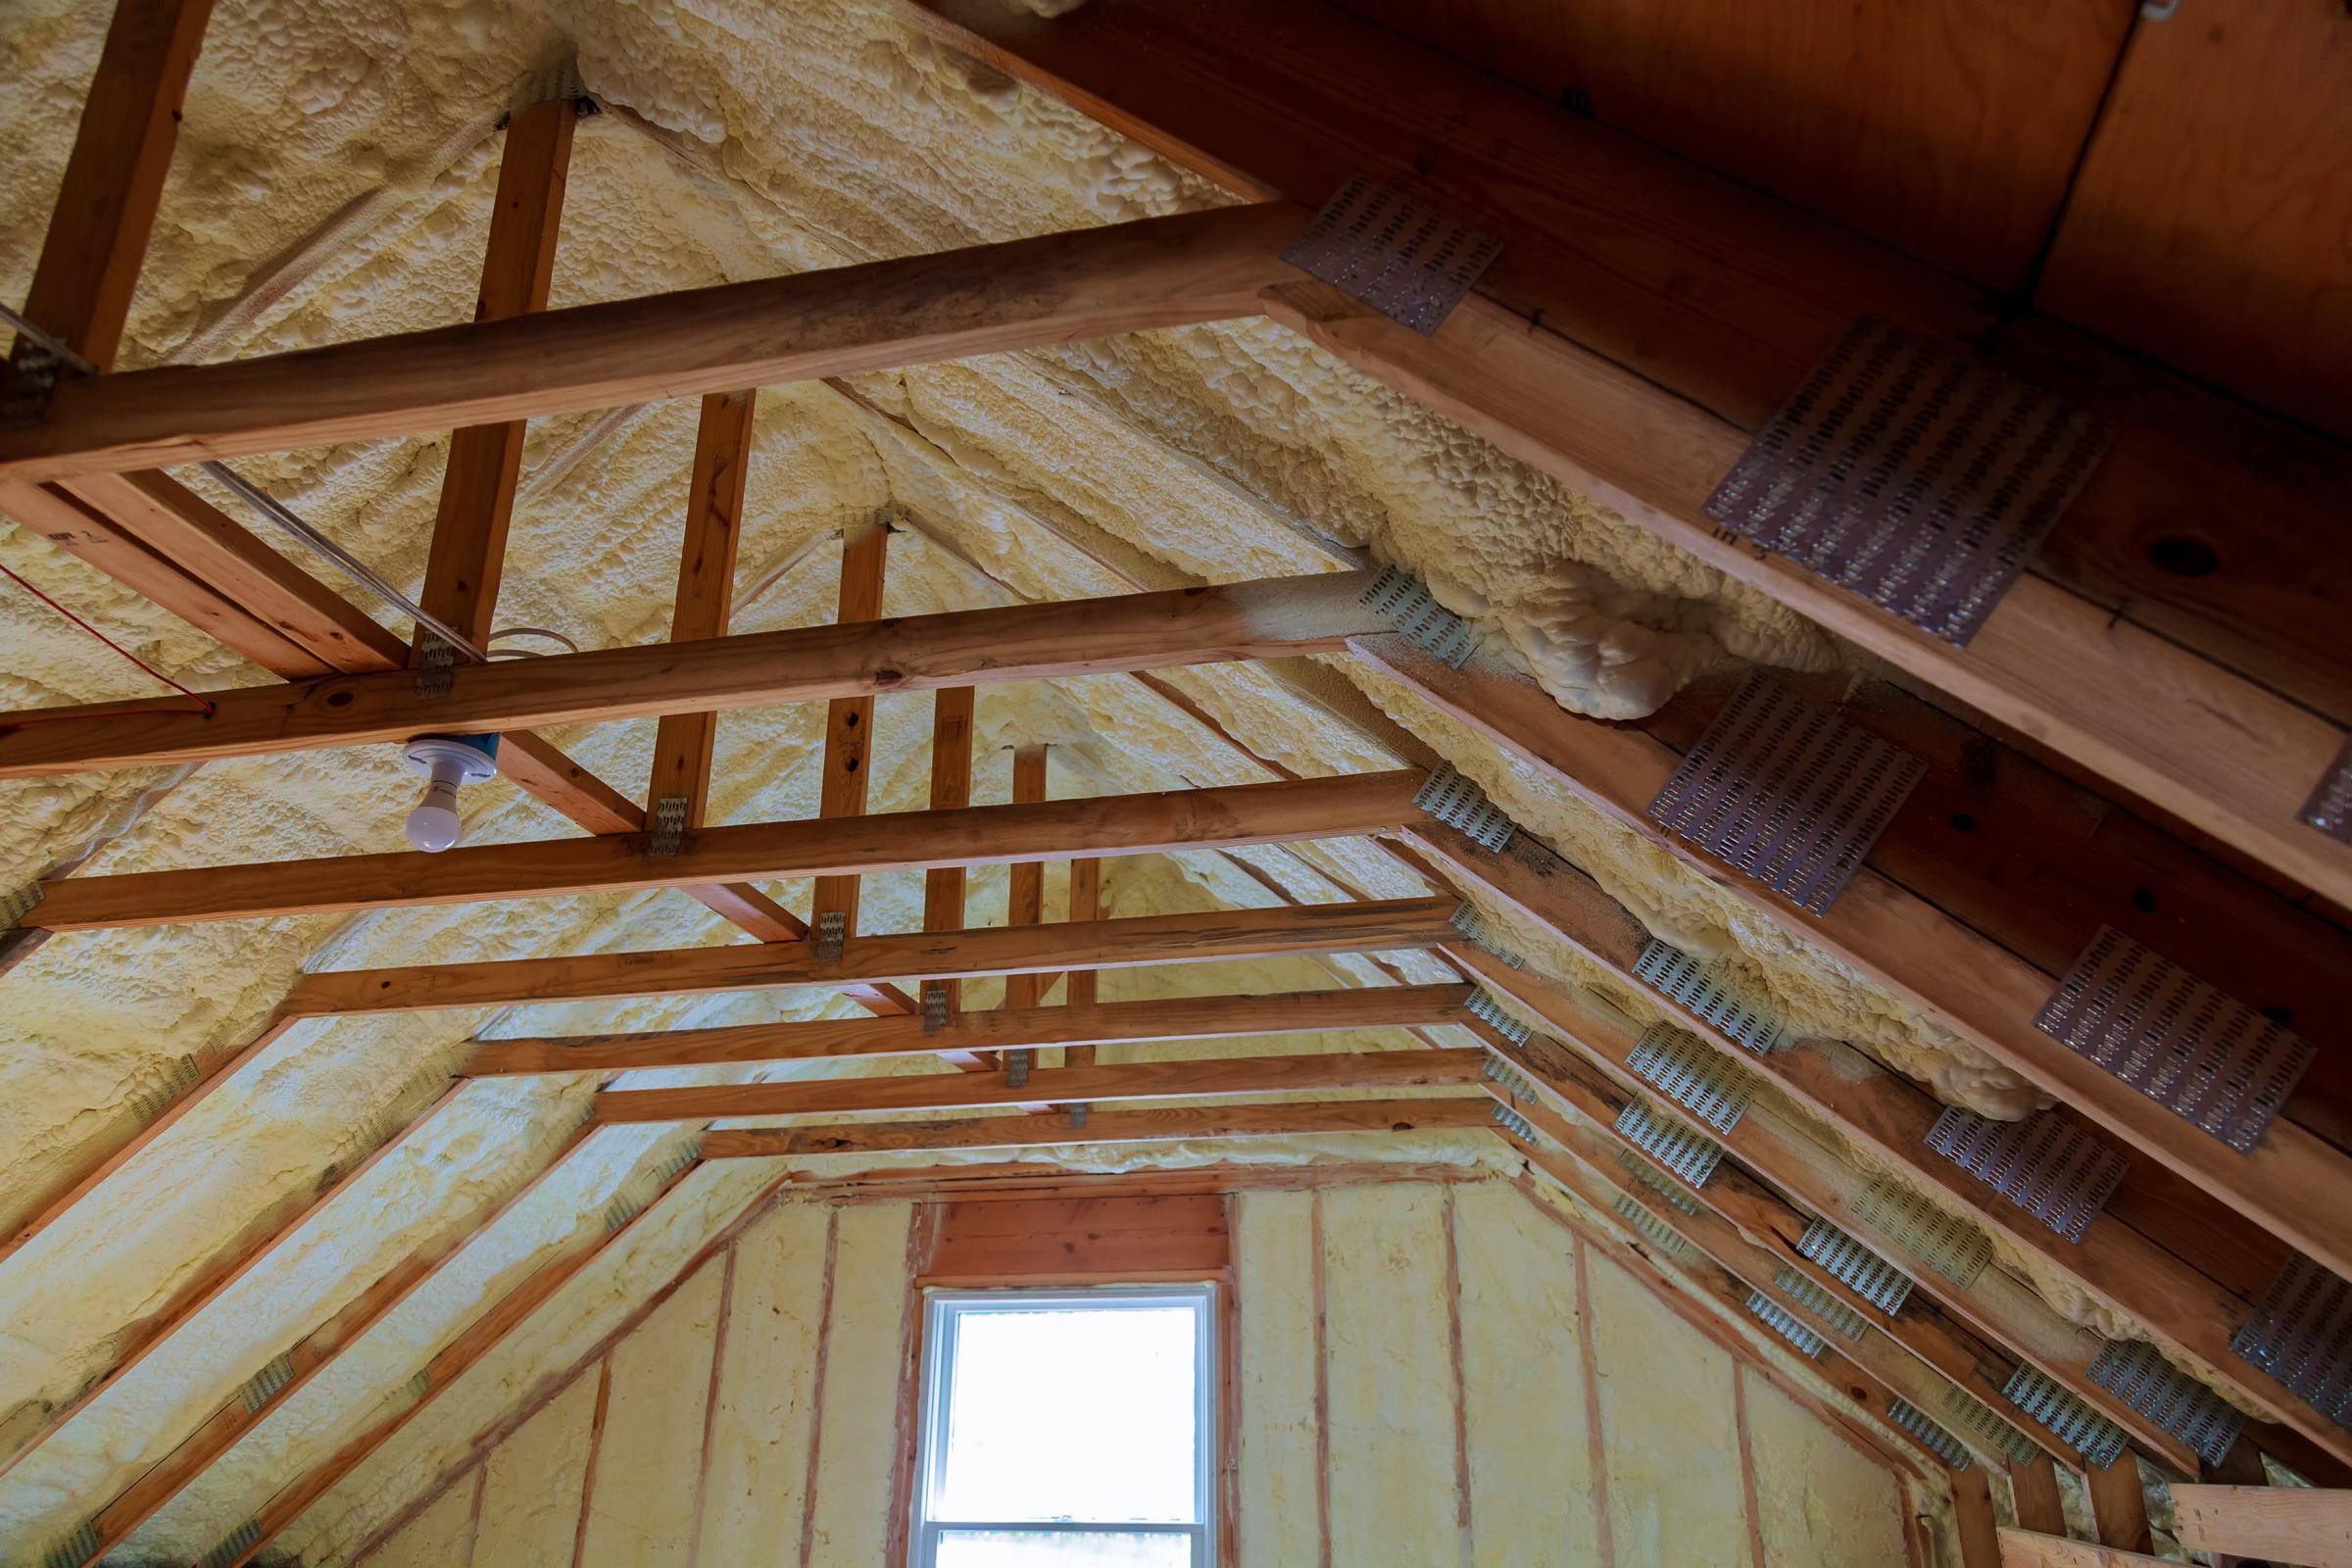 environmentally friendly insulation in attic